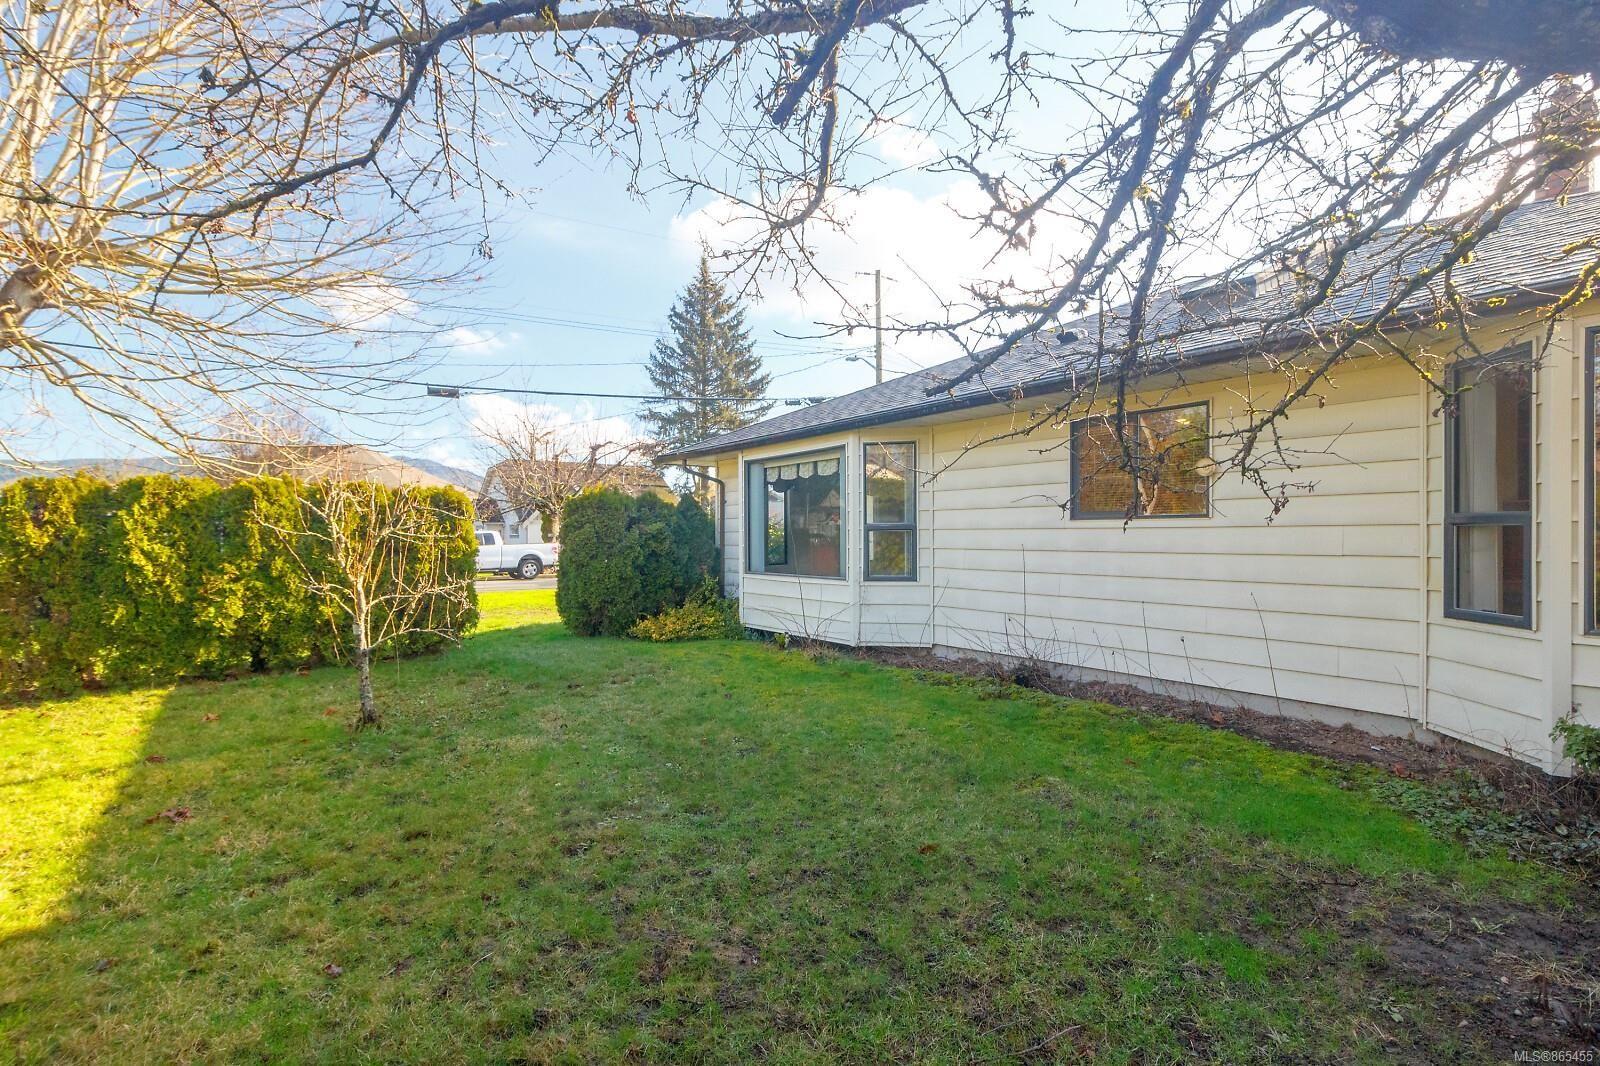 Photo 29: Photos: 399 Beech Ave in : Du East Duncan House for sale (Duncan)  : MLS®# 865455